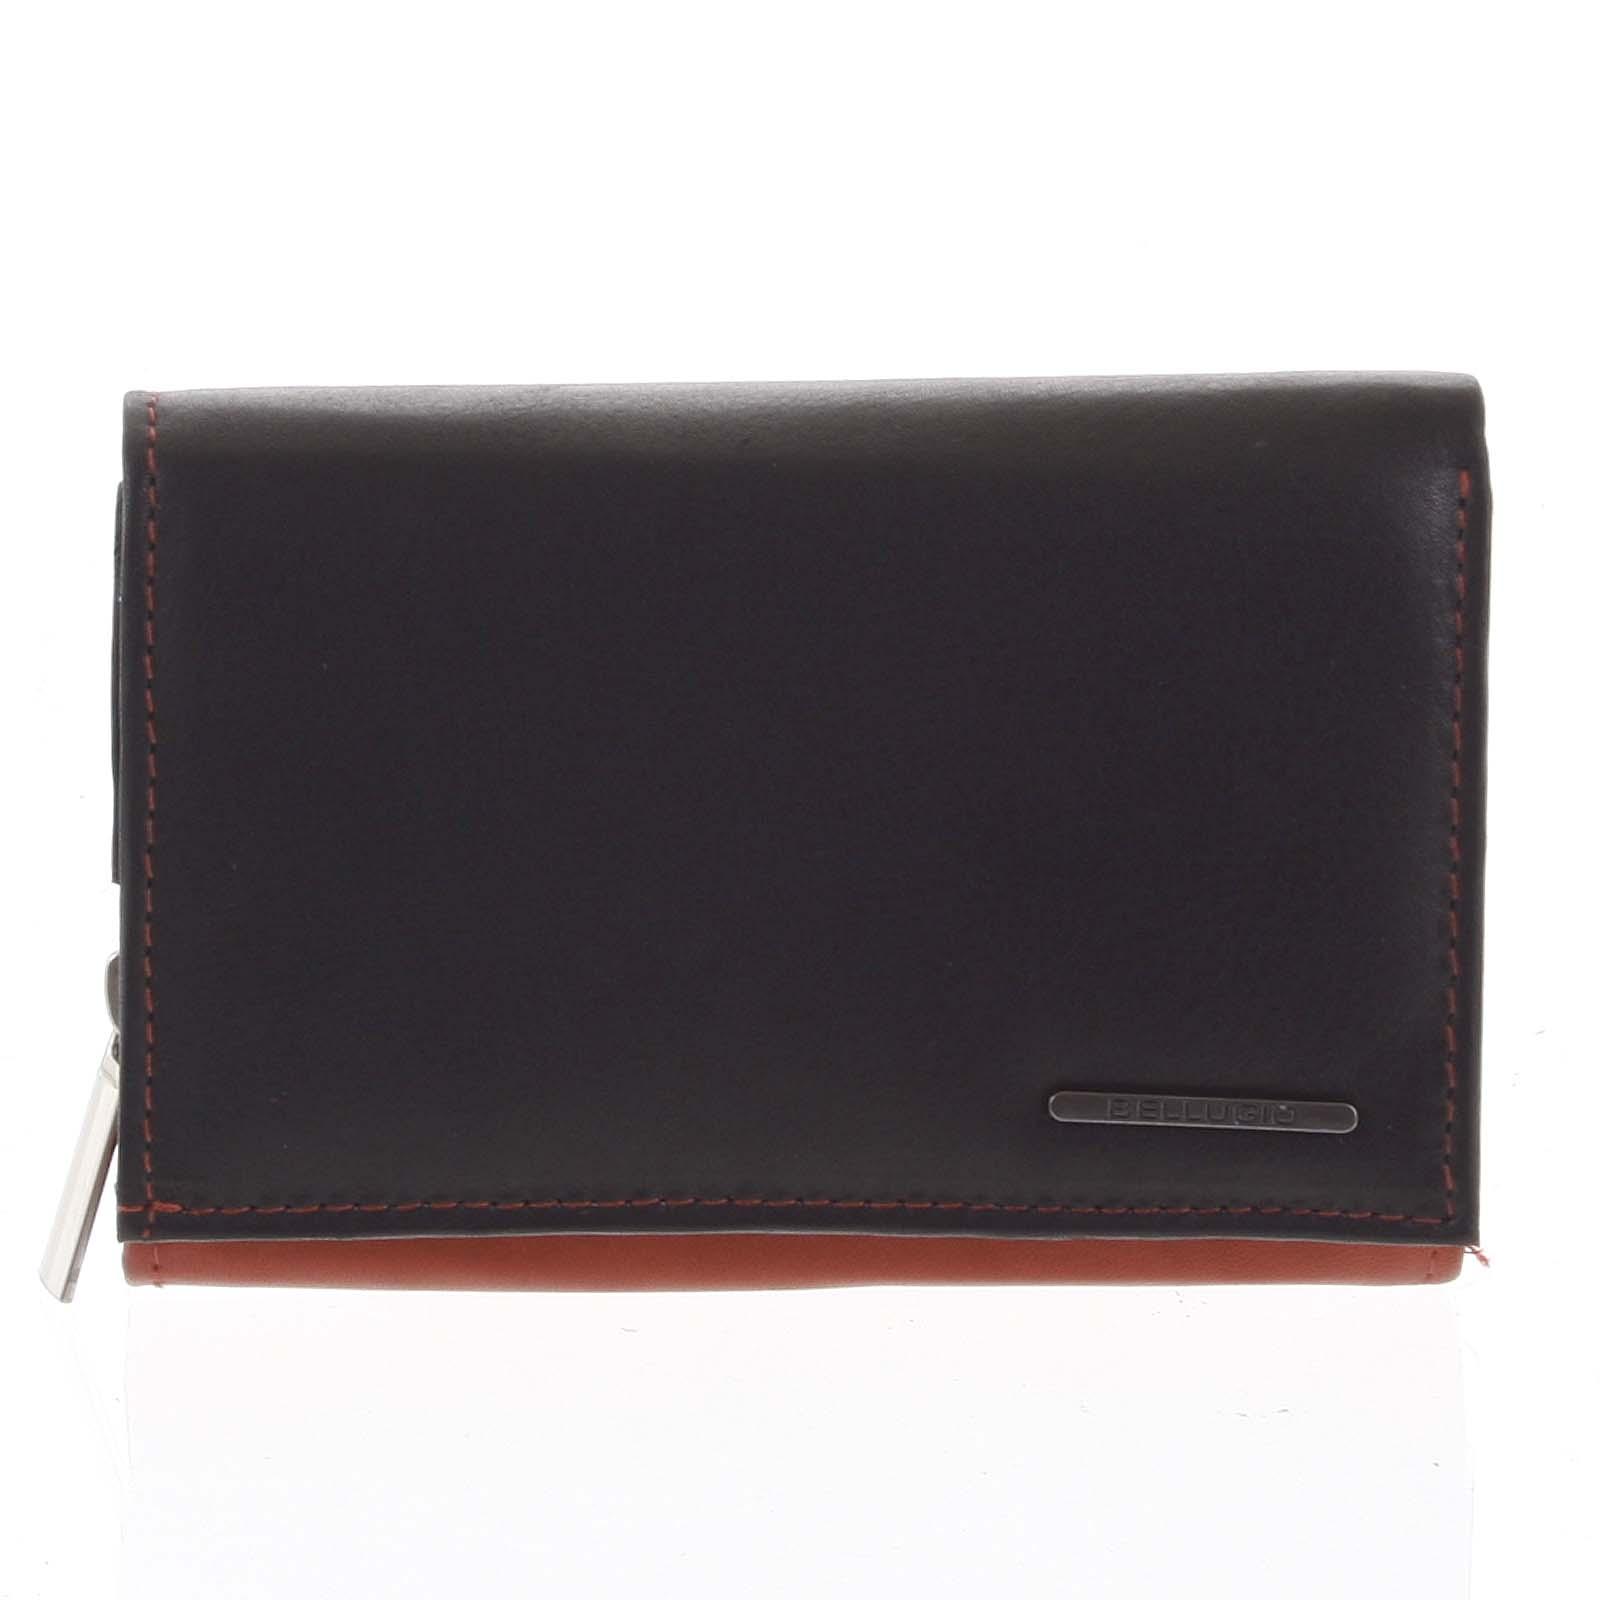 Dámská kožená peněženka červeno černá - Bellugio Averi